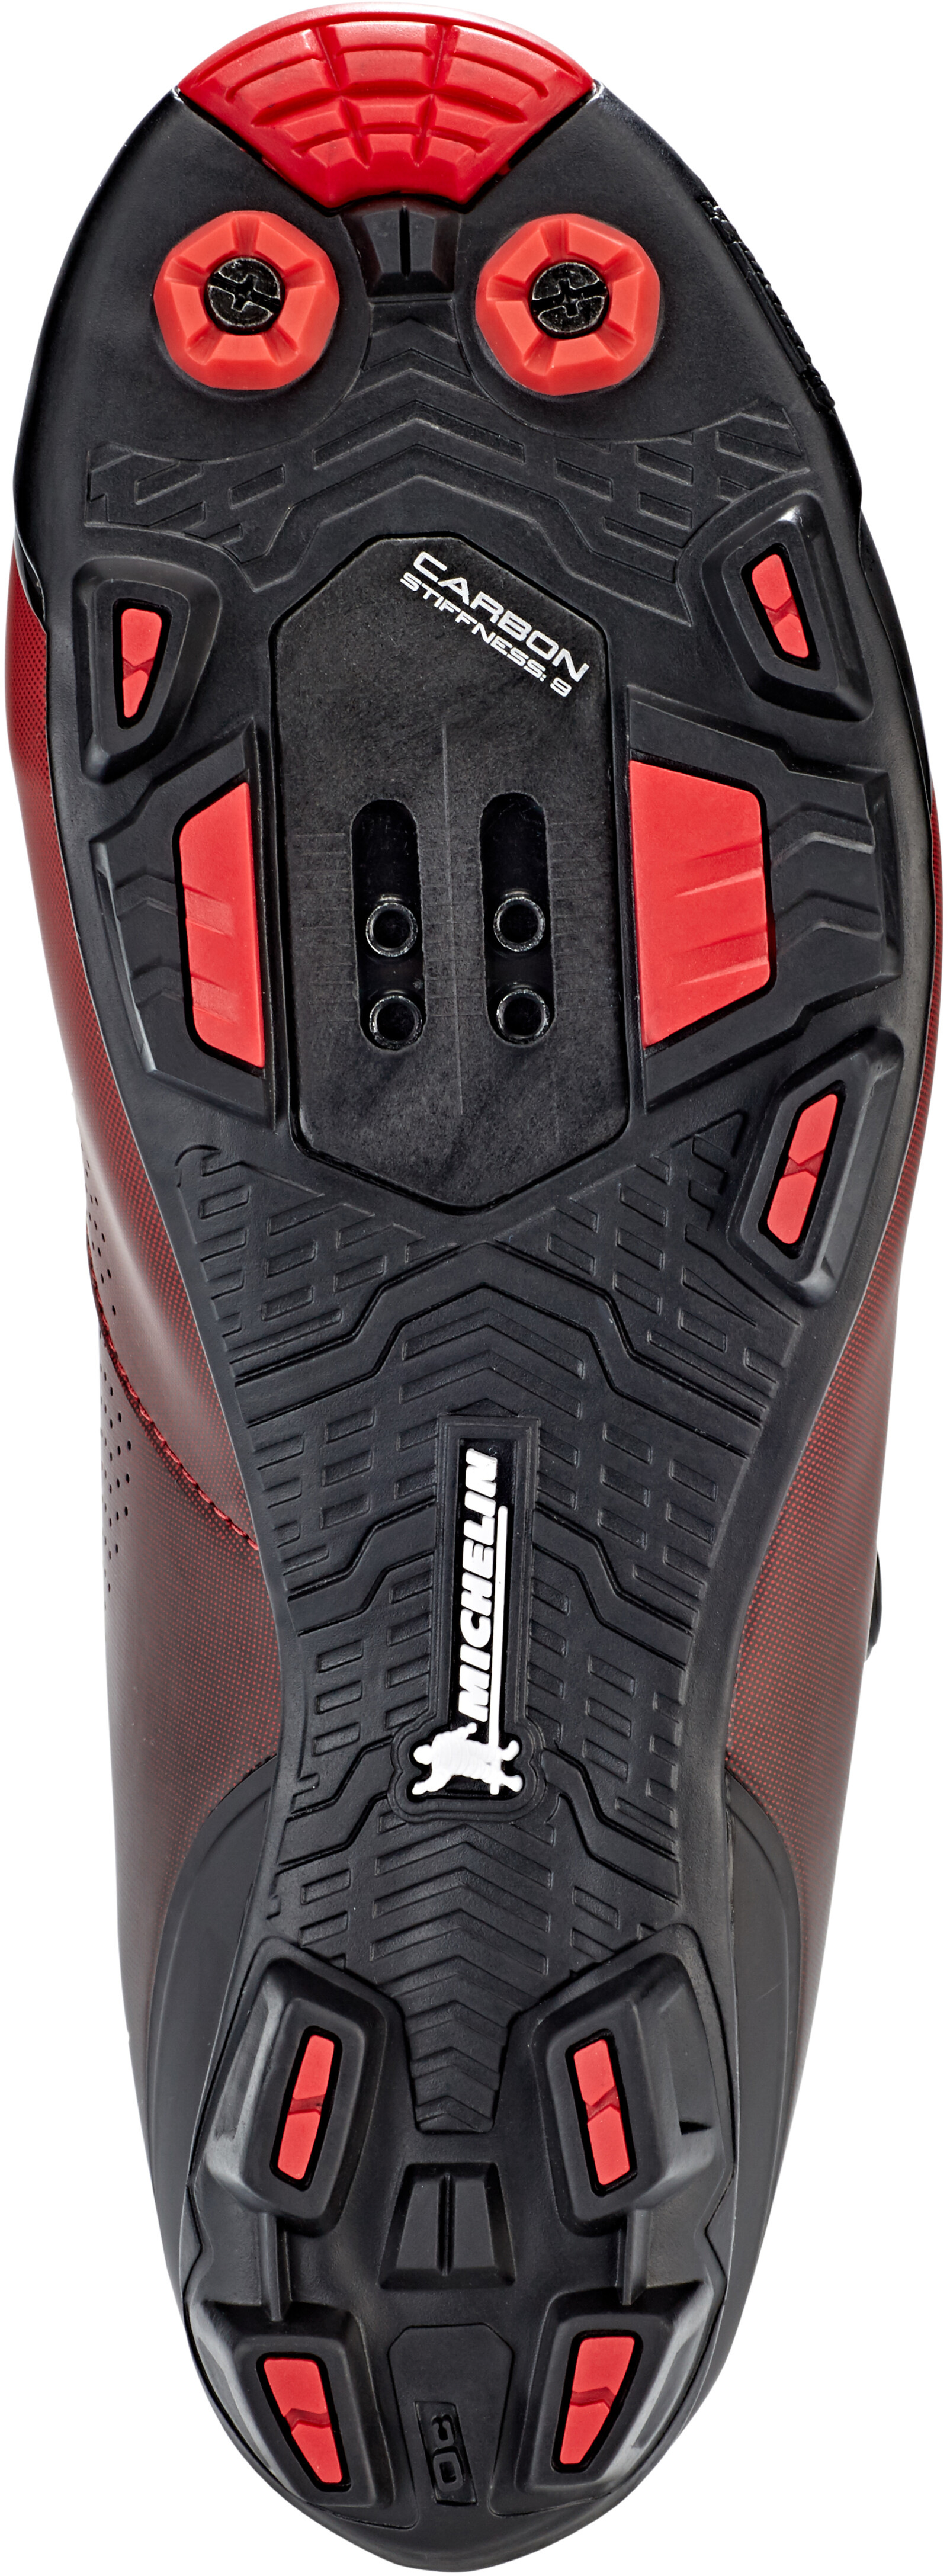 e3b5d48ec70dd9 Shimano SH-XC701 Shoes red at Bikester.co.uk